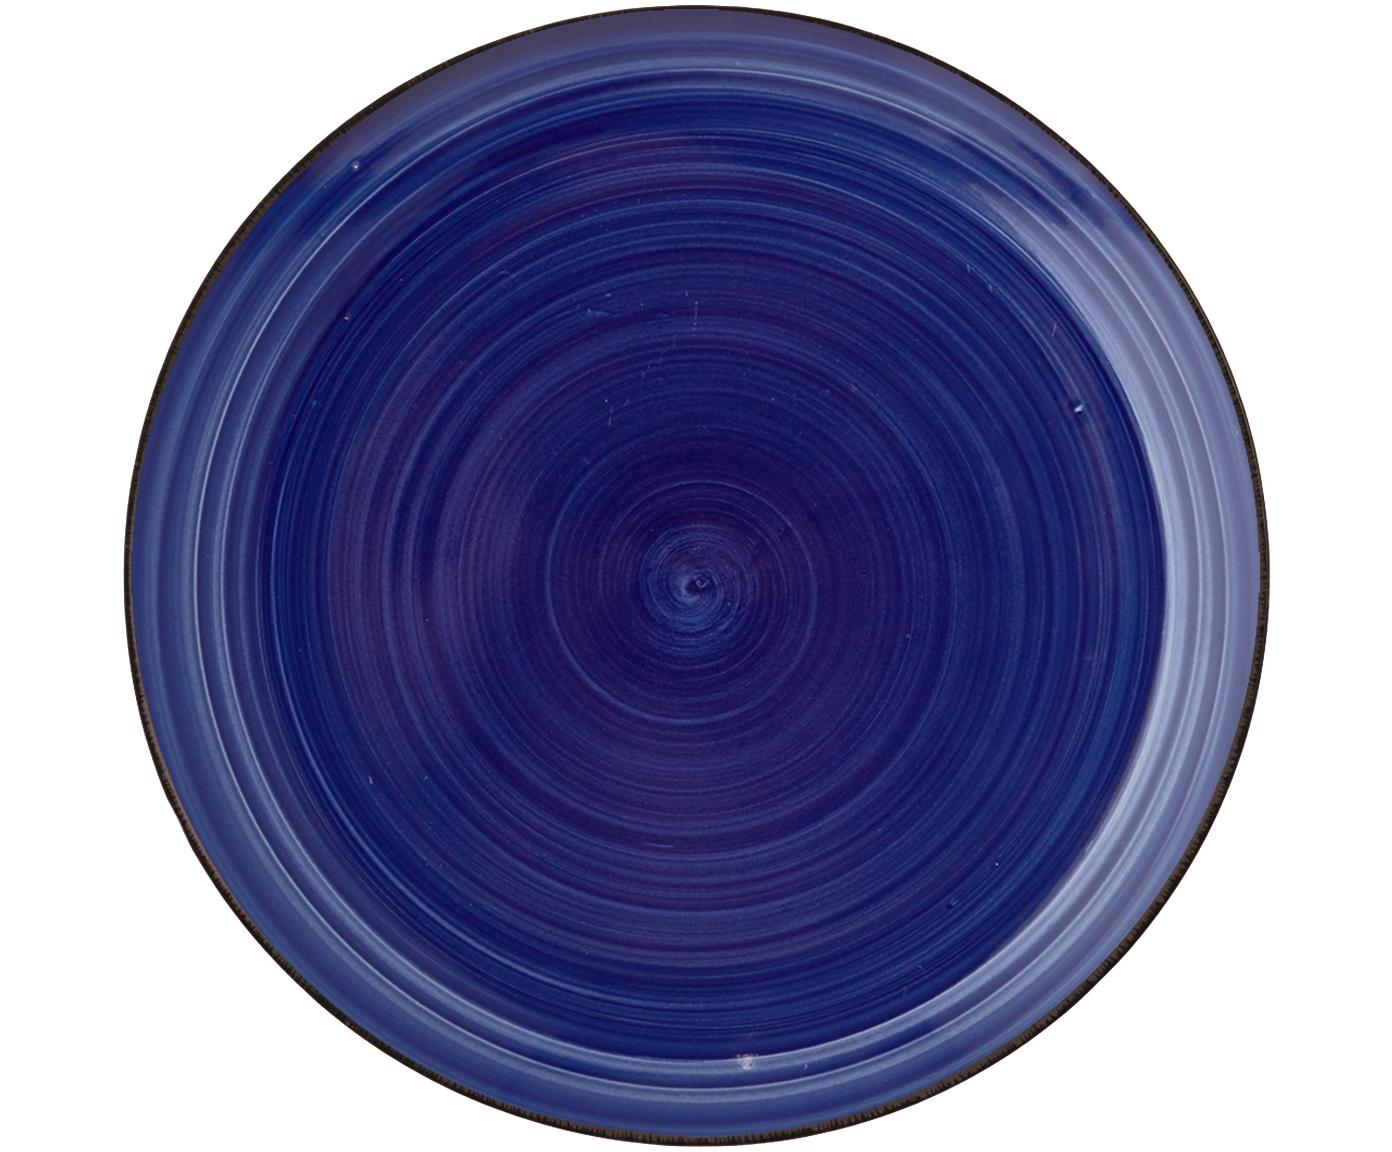 Piattino da dessert dipinto  a mano Baita 6 pz, Terracotta (Hard Dolomite), dipinto a mano, Blu, Ø 20 cm